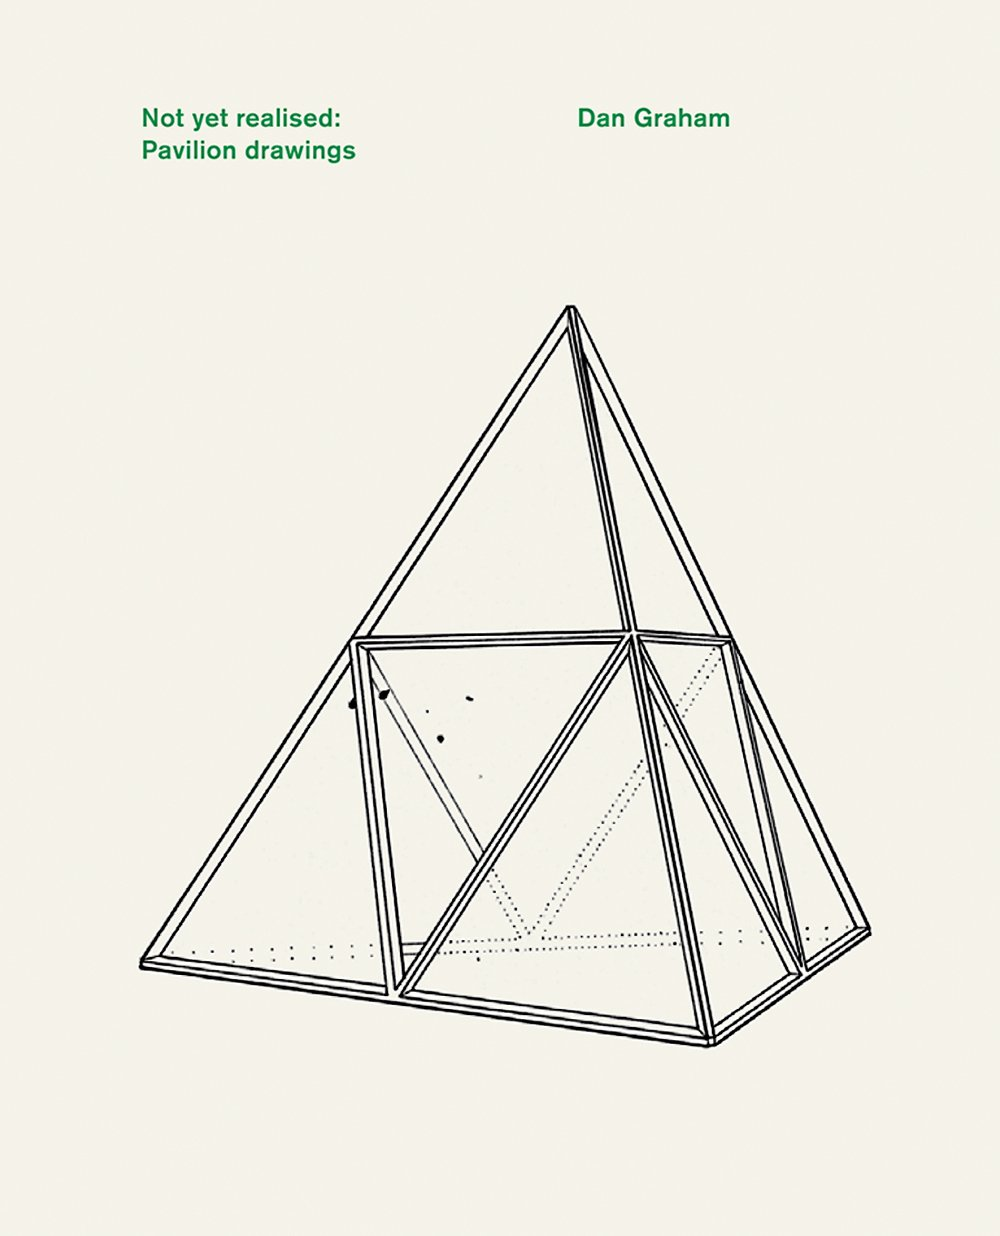 Dan Graham: Not Yet Realised, Pavilion Drawings